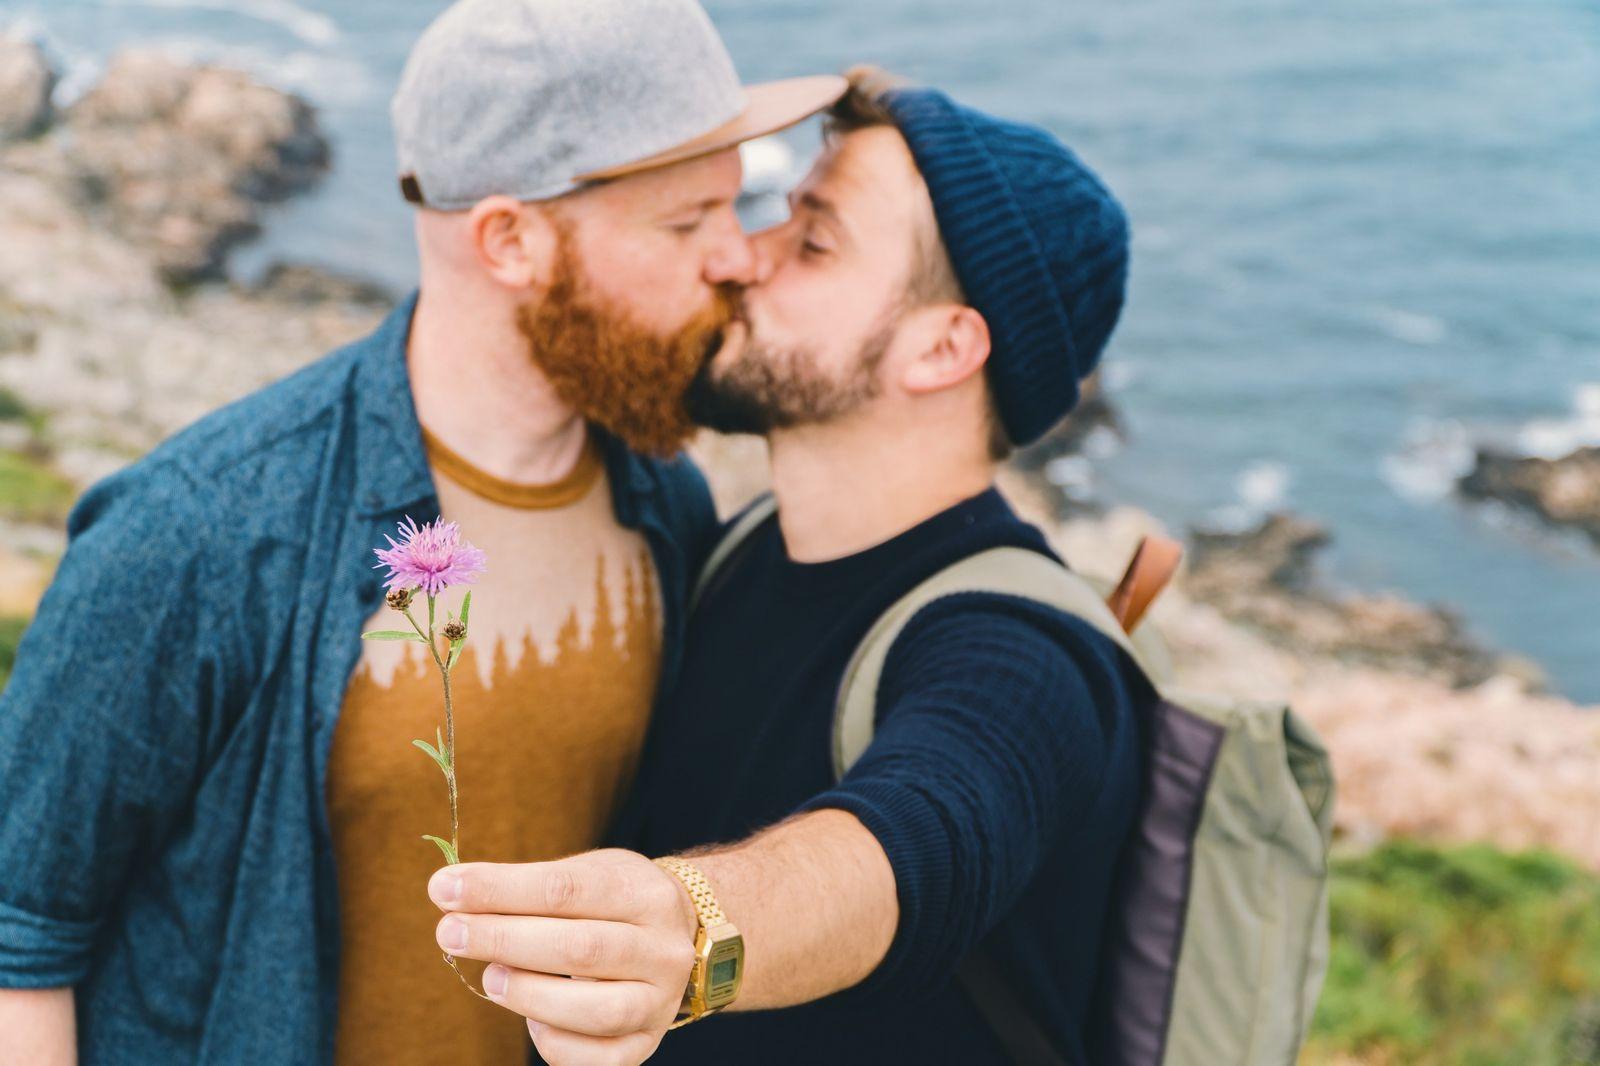 LGBTQ + STORYTELLER - Couple of Men_Daan (left) and Karl (right) in Sweden